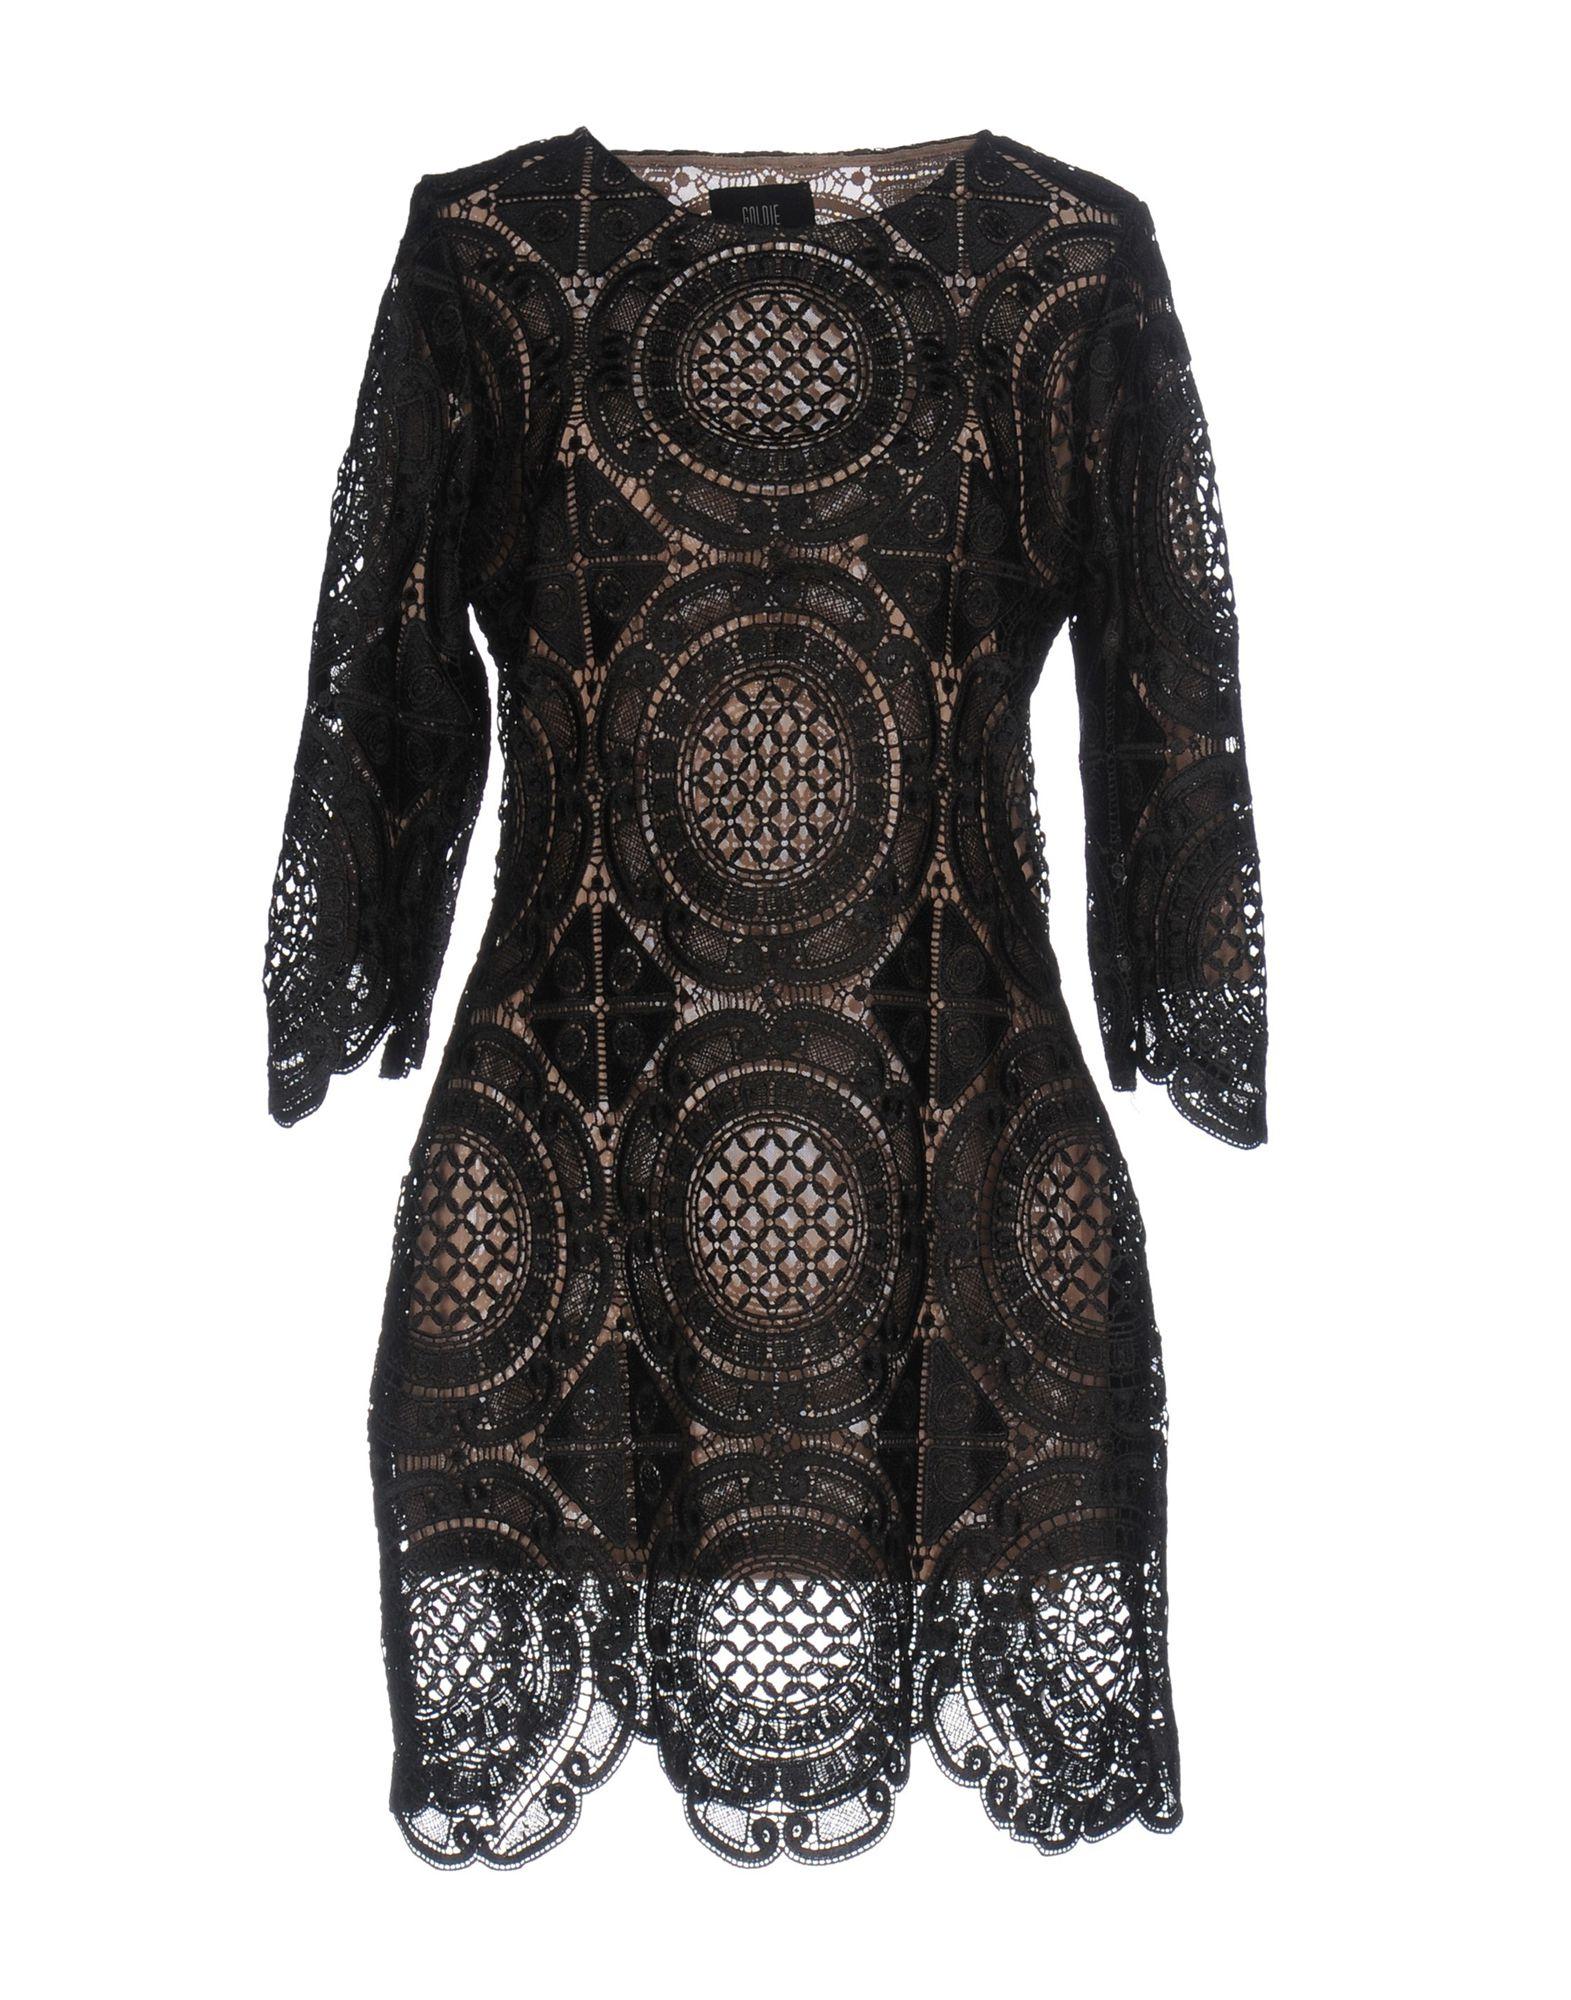 GOLDIE LONDON Short Dress in Black